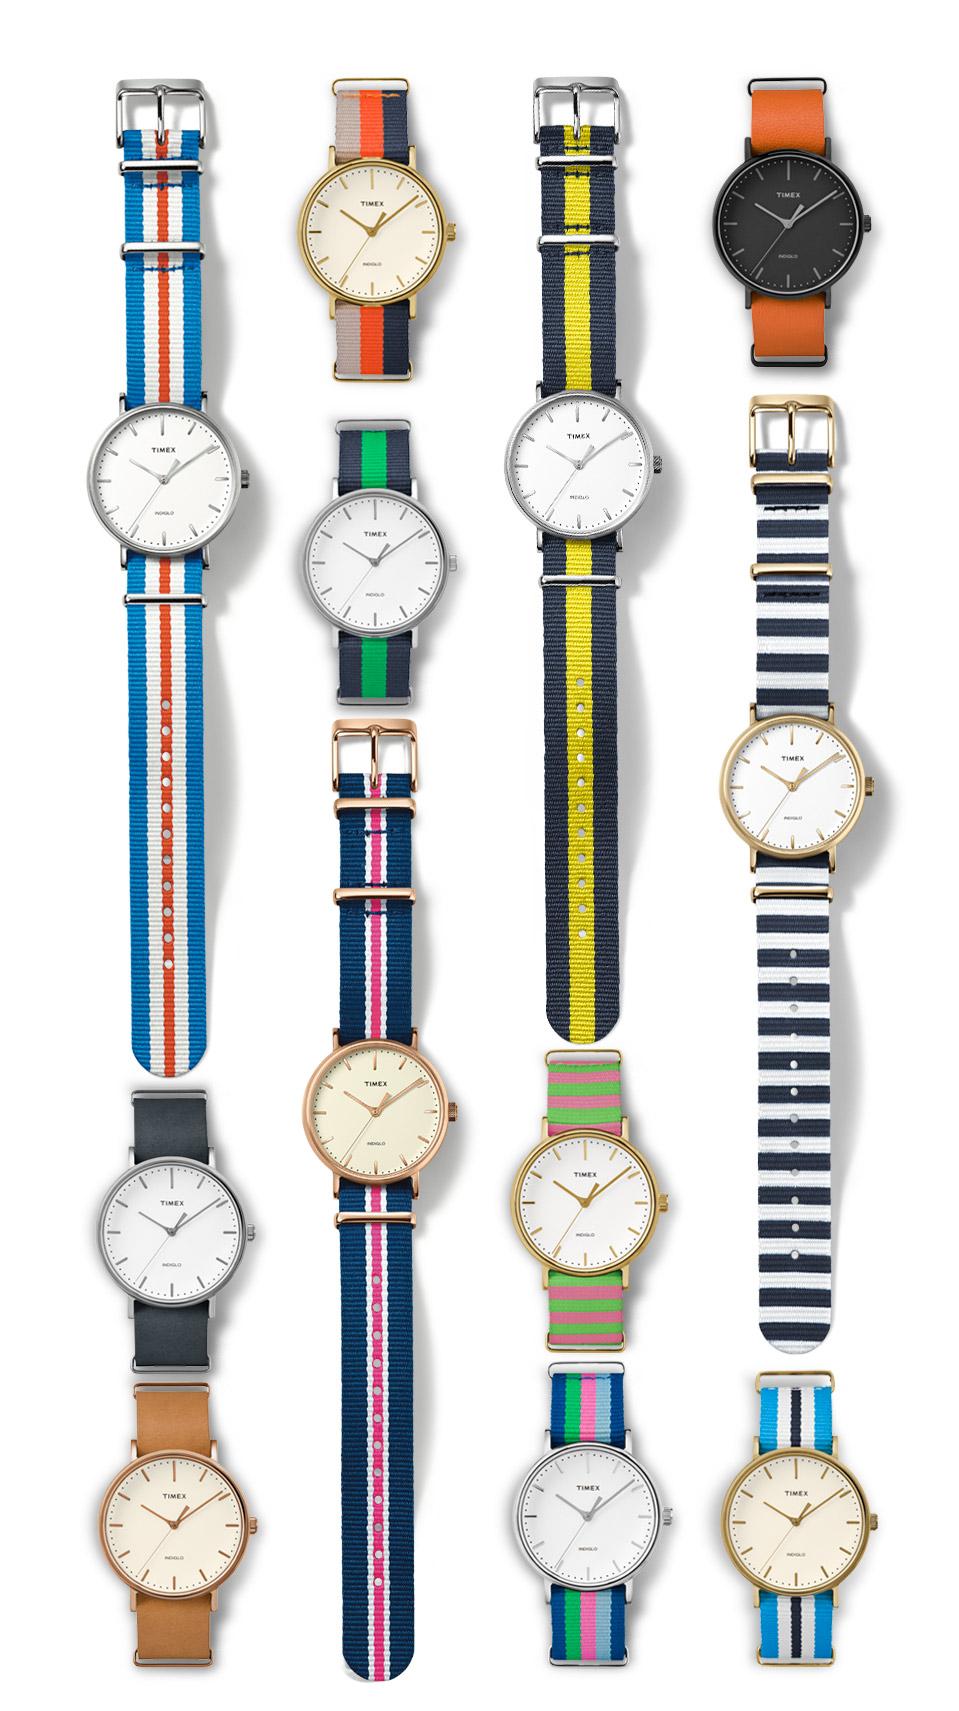 331d71b00 Timex Weekender Fairfield – blogeri milujú textilné remienky. A čo ...